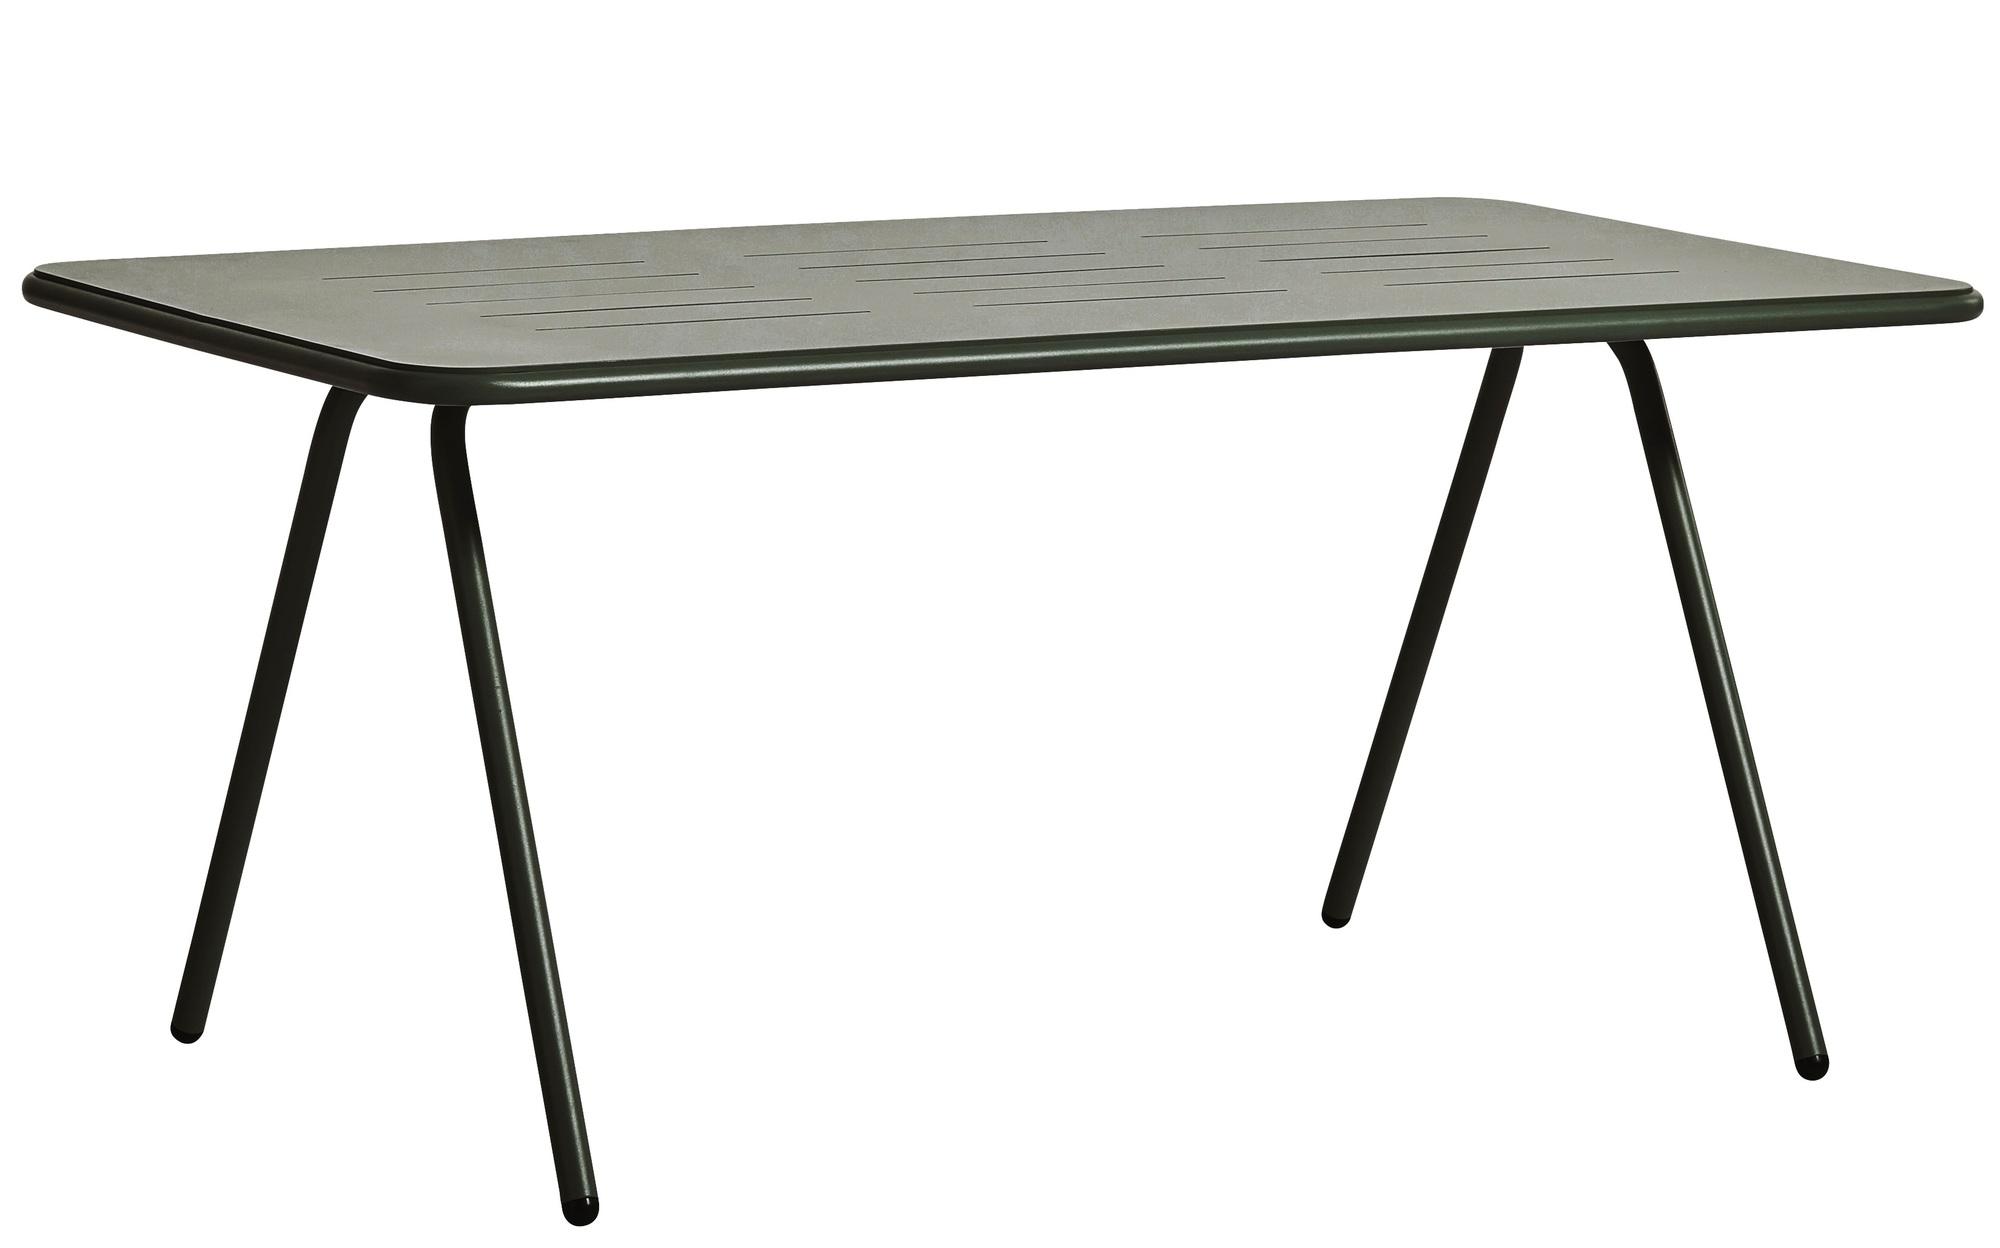 RAY Dining Table (160cm) Outdoor Tisch Dunkel grün Woud